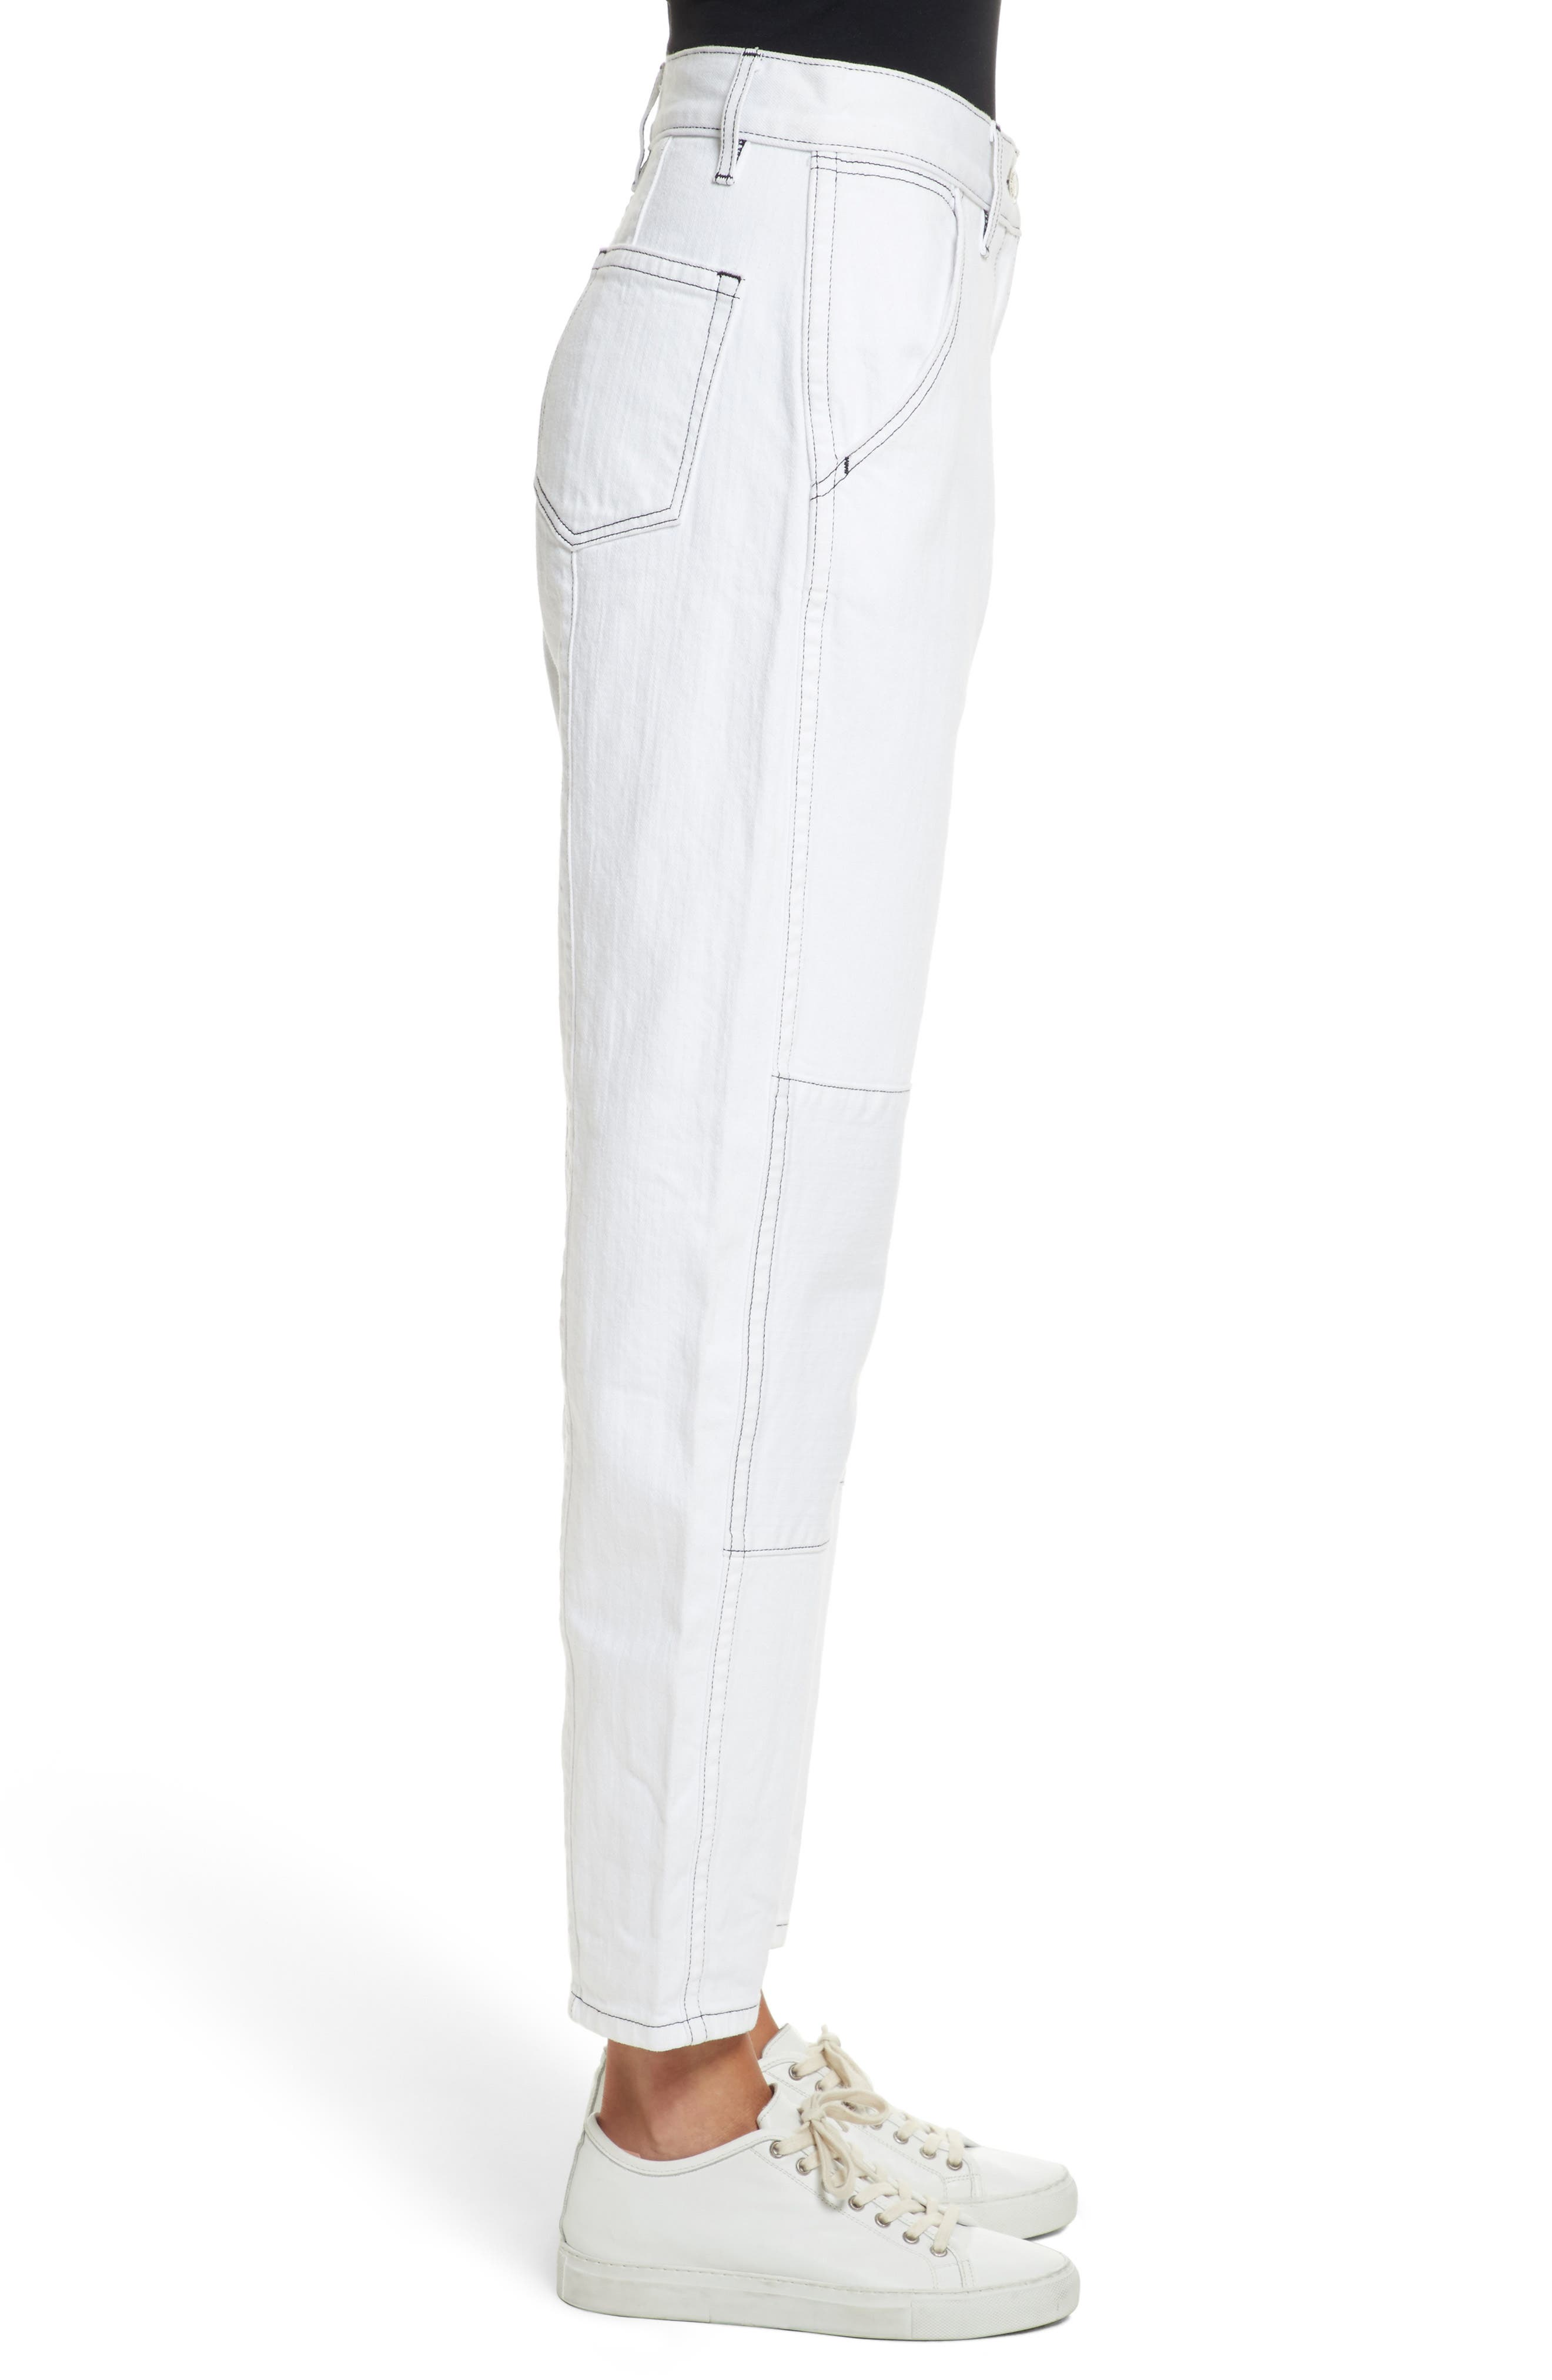 Pamela Ankle Jeans,                             Alternate thumbnail 3, color,                             100